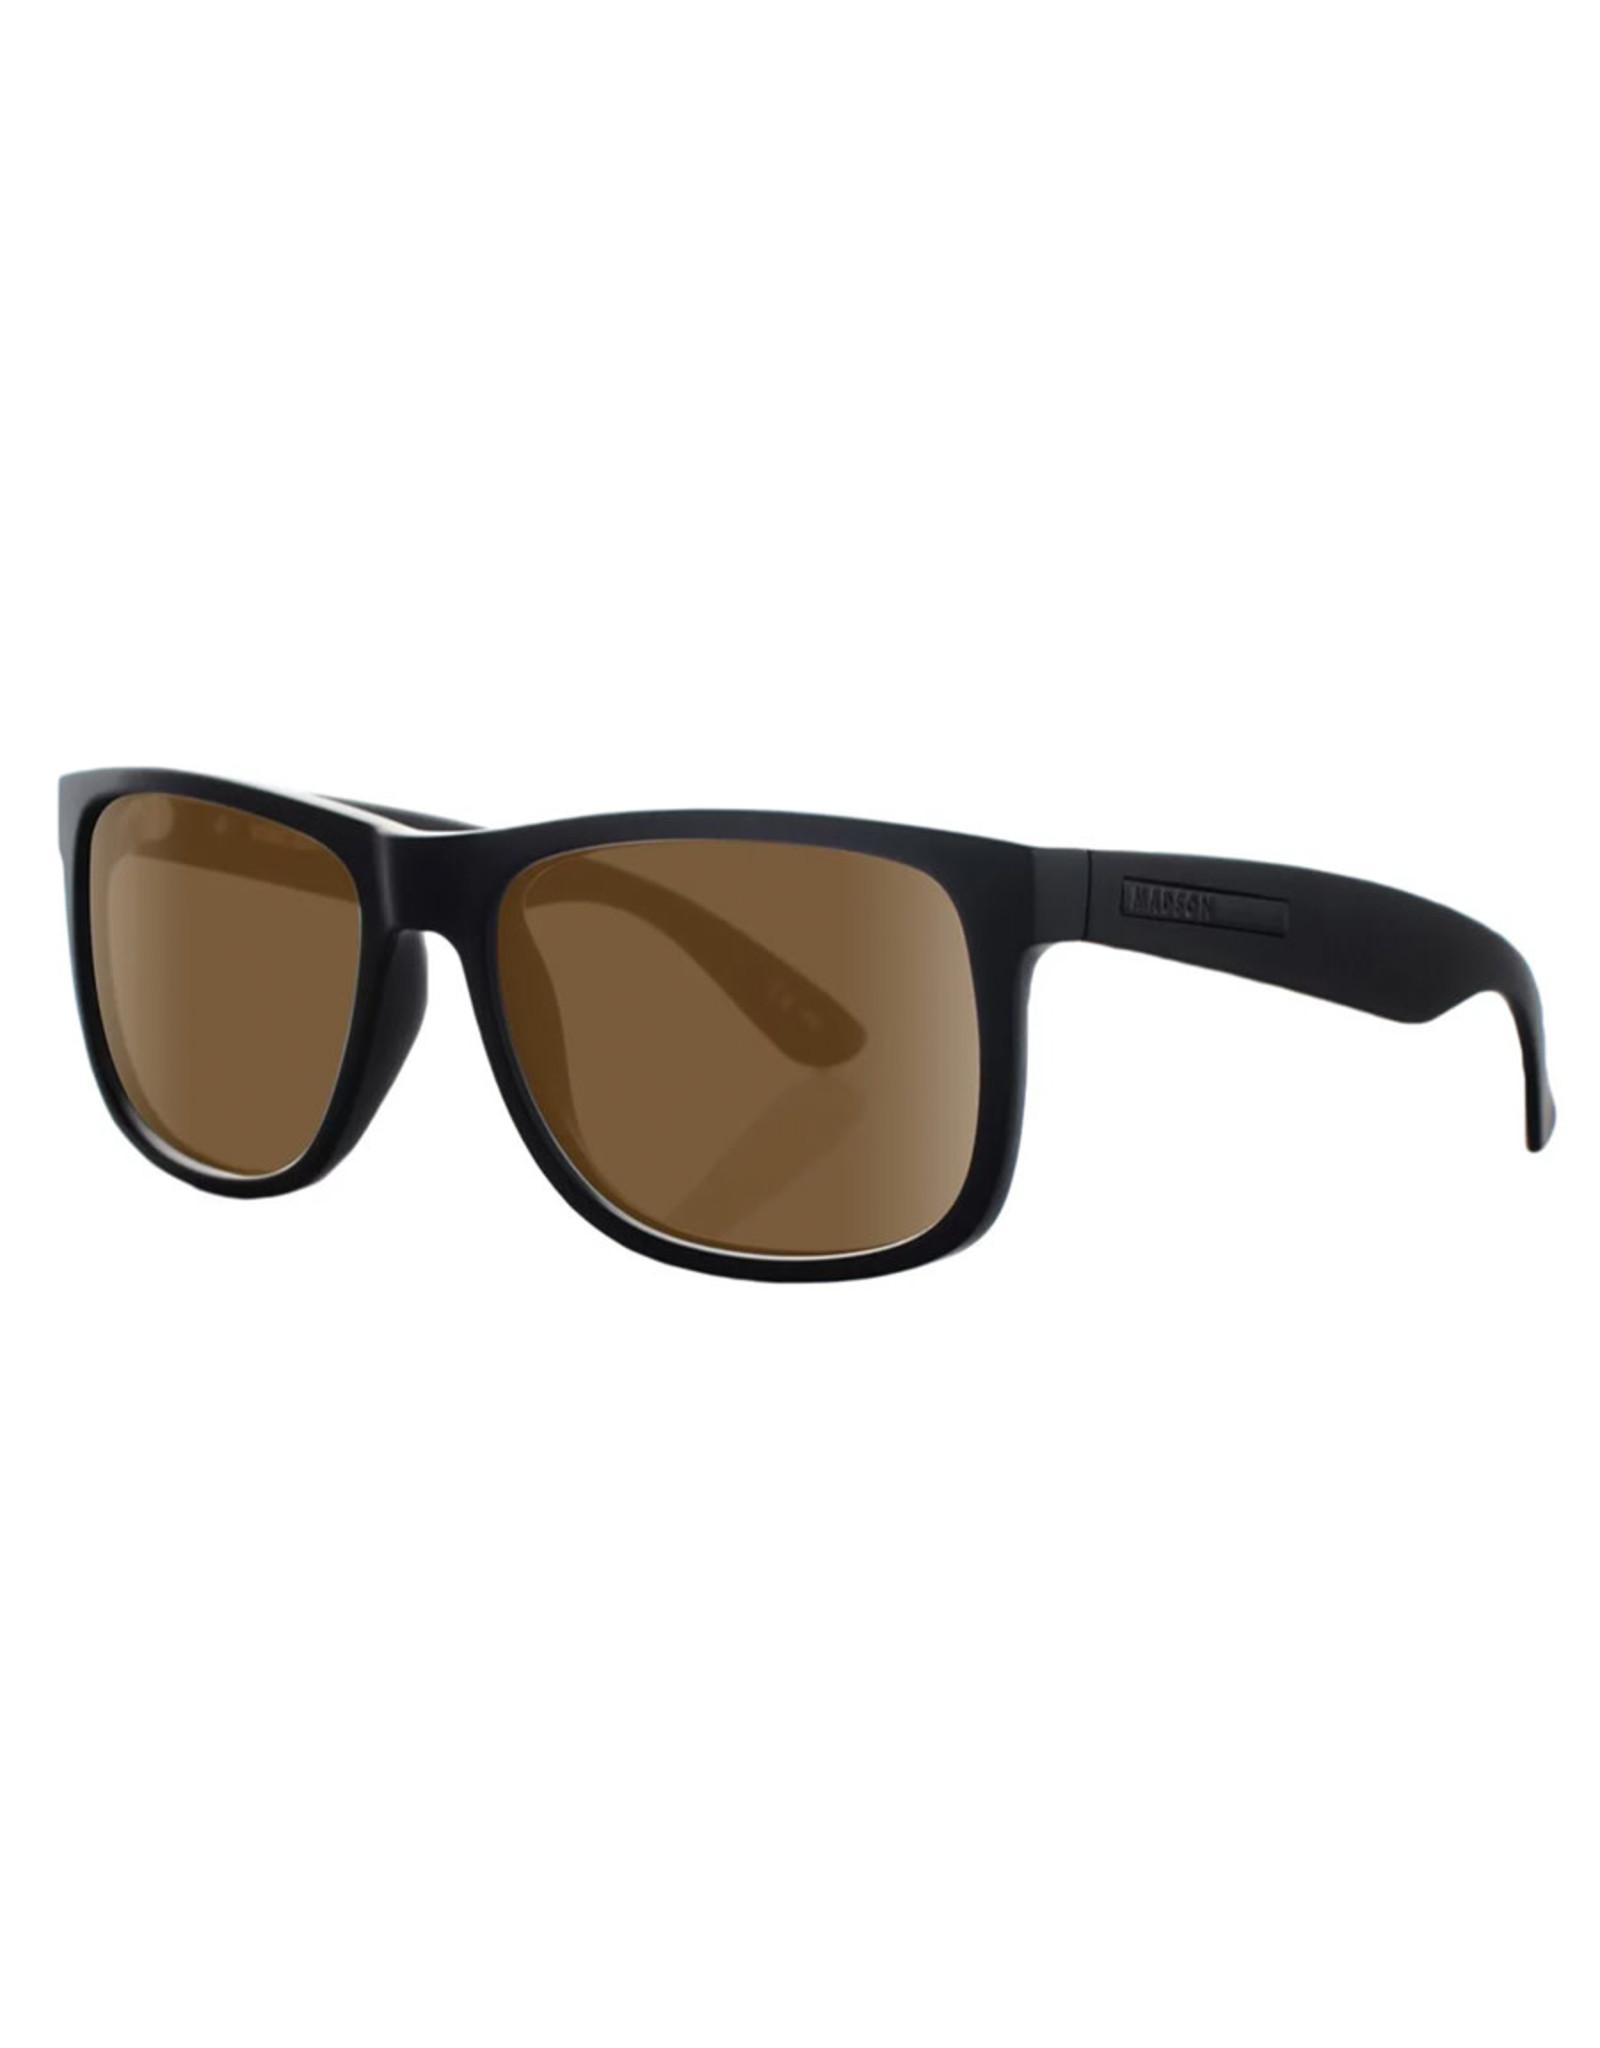 Madson Madson Sunglasses Vincent (Black On Black/Bronze Polarized Lens)